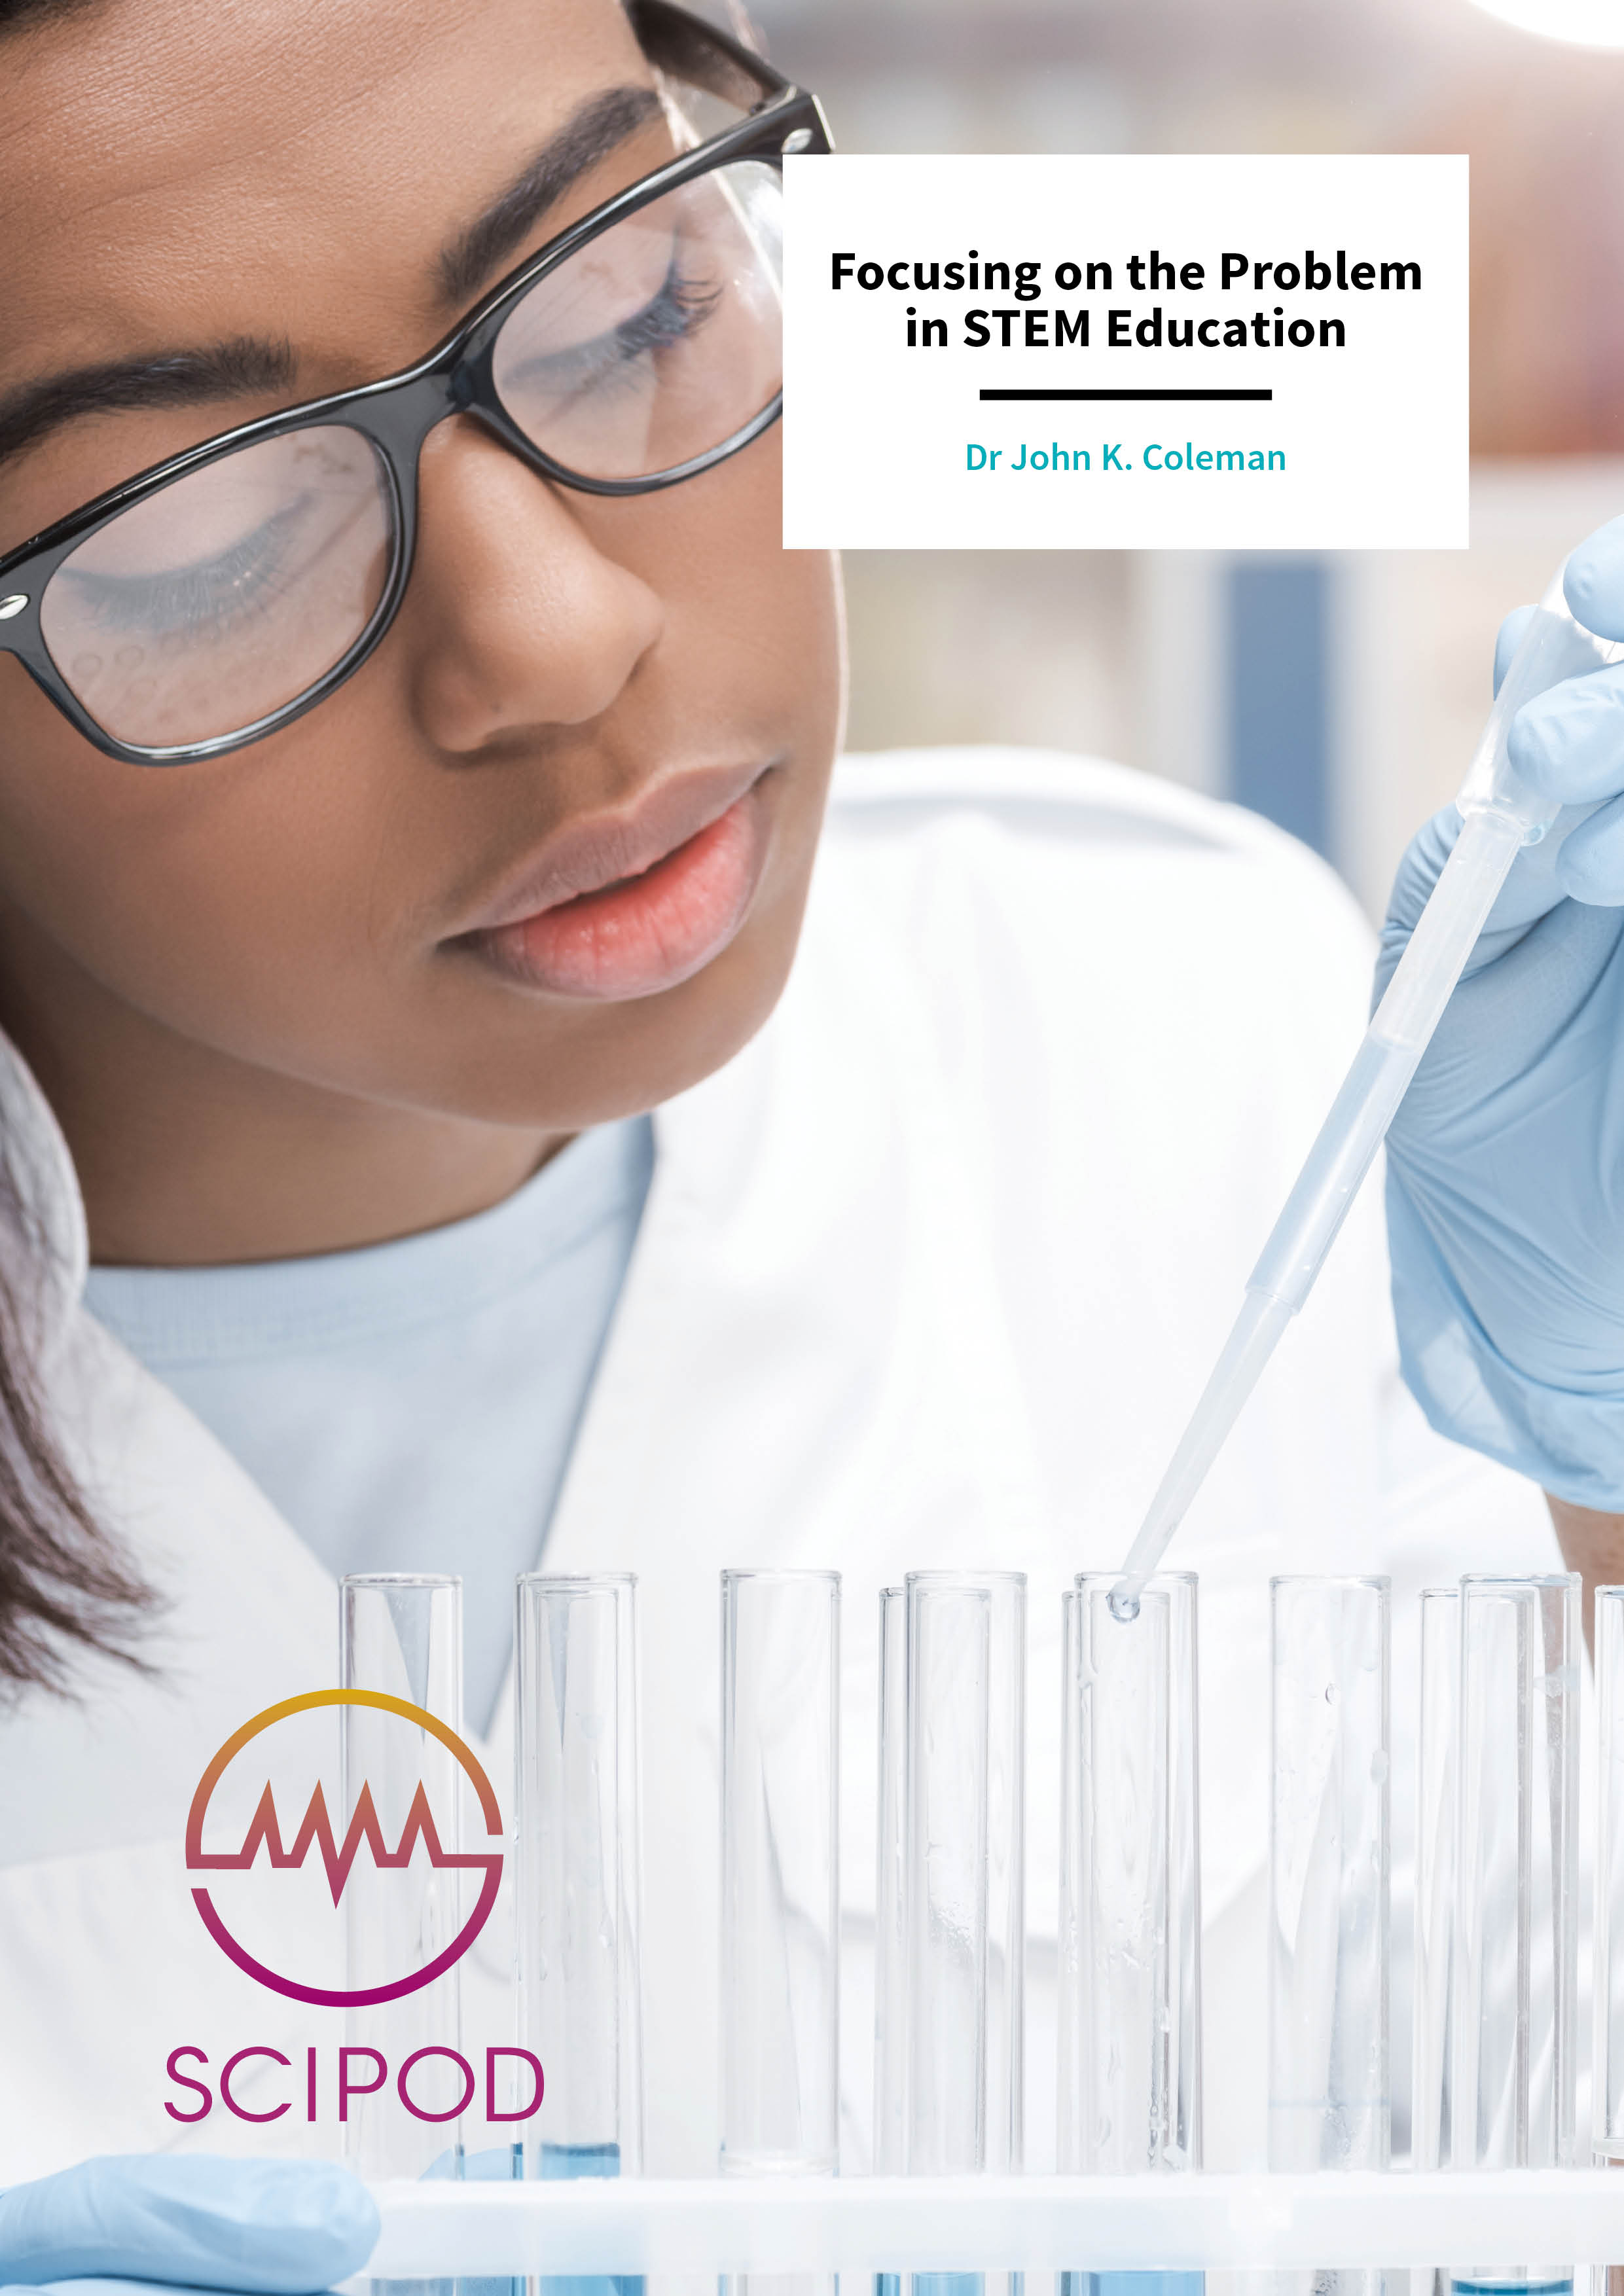 Focusing on the Problem in STEM Education – Dr John K. Coleman, Langston University